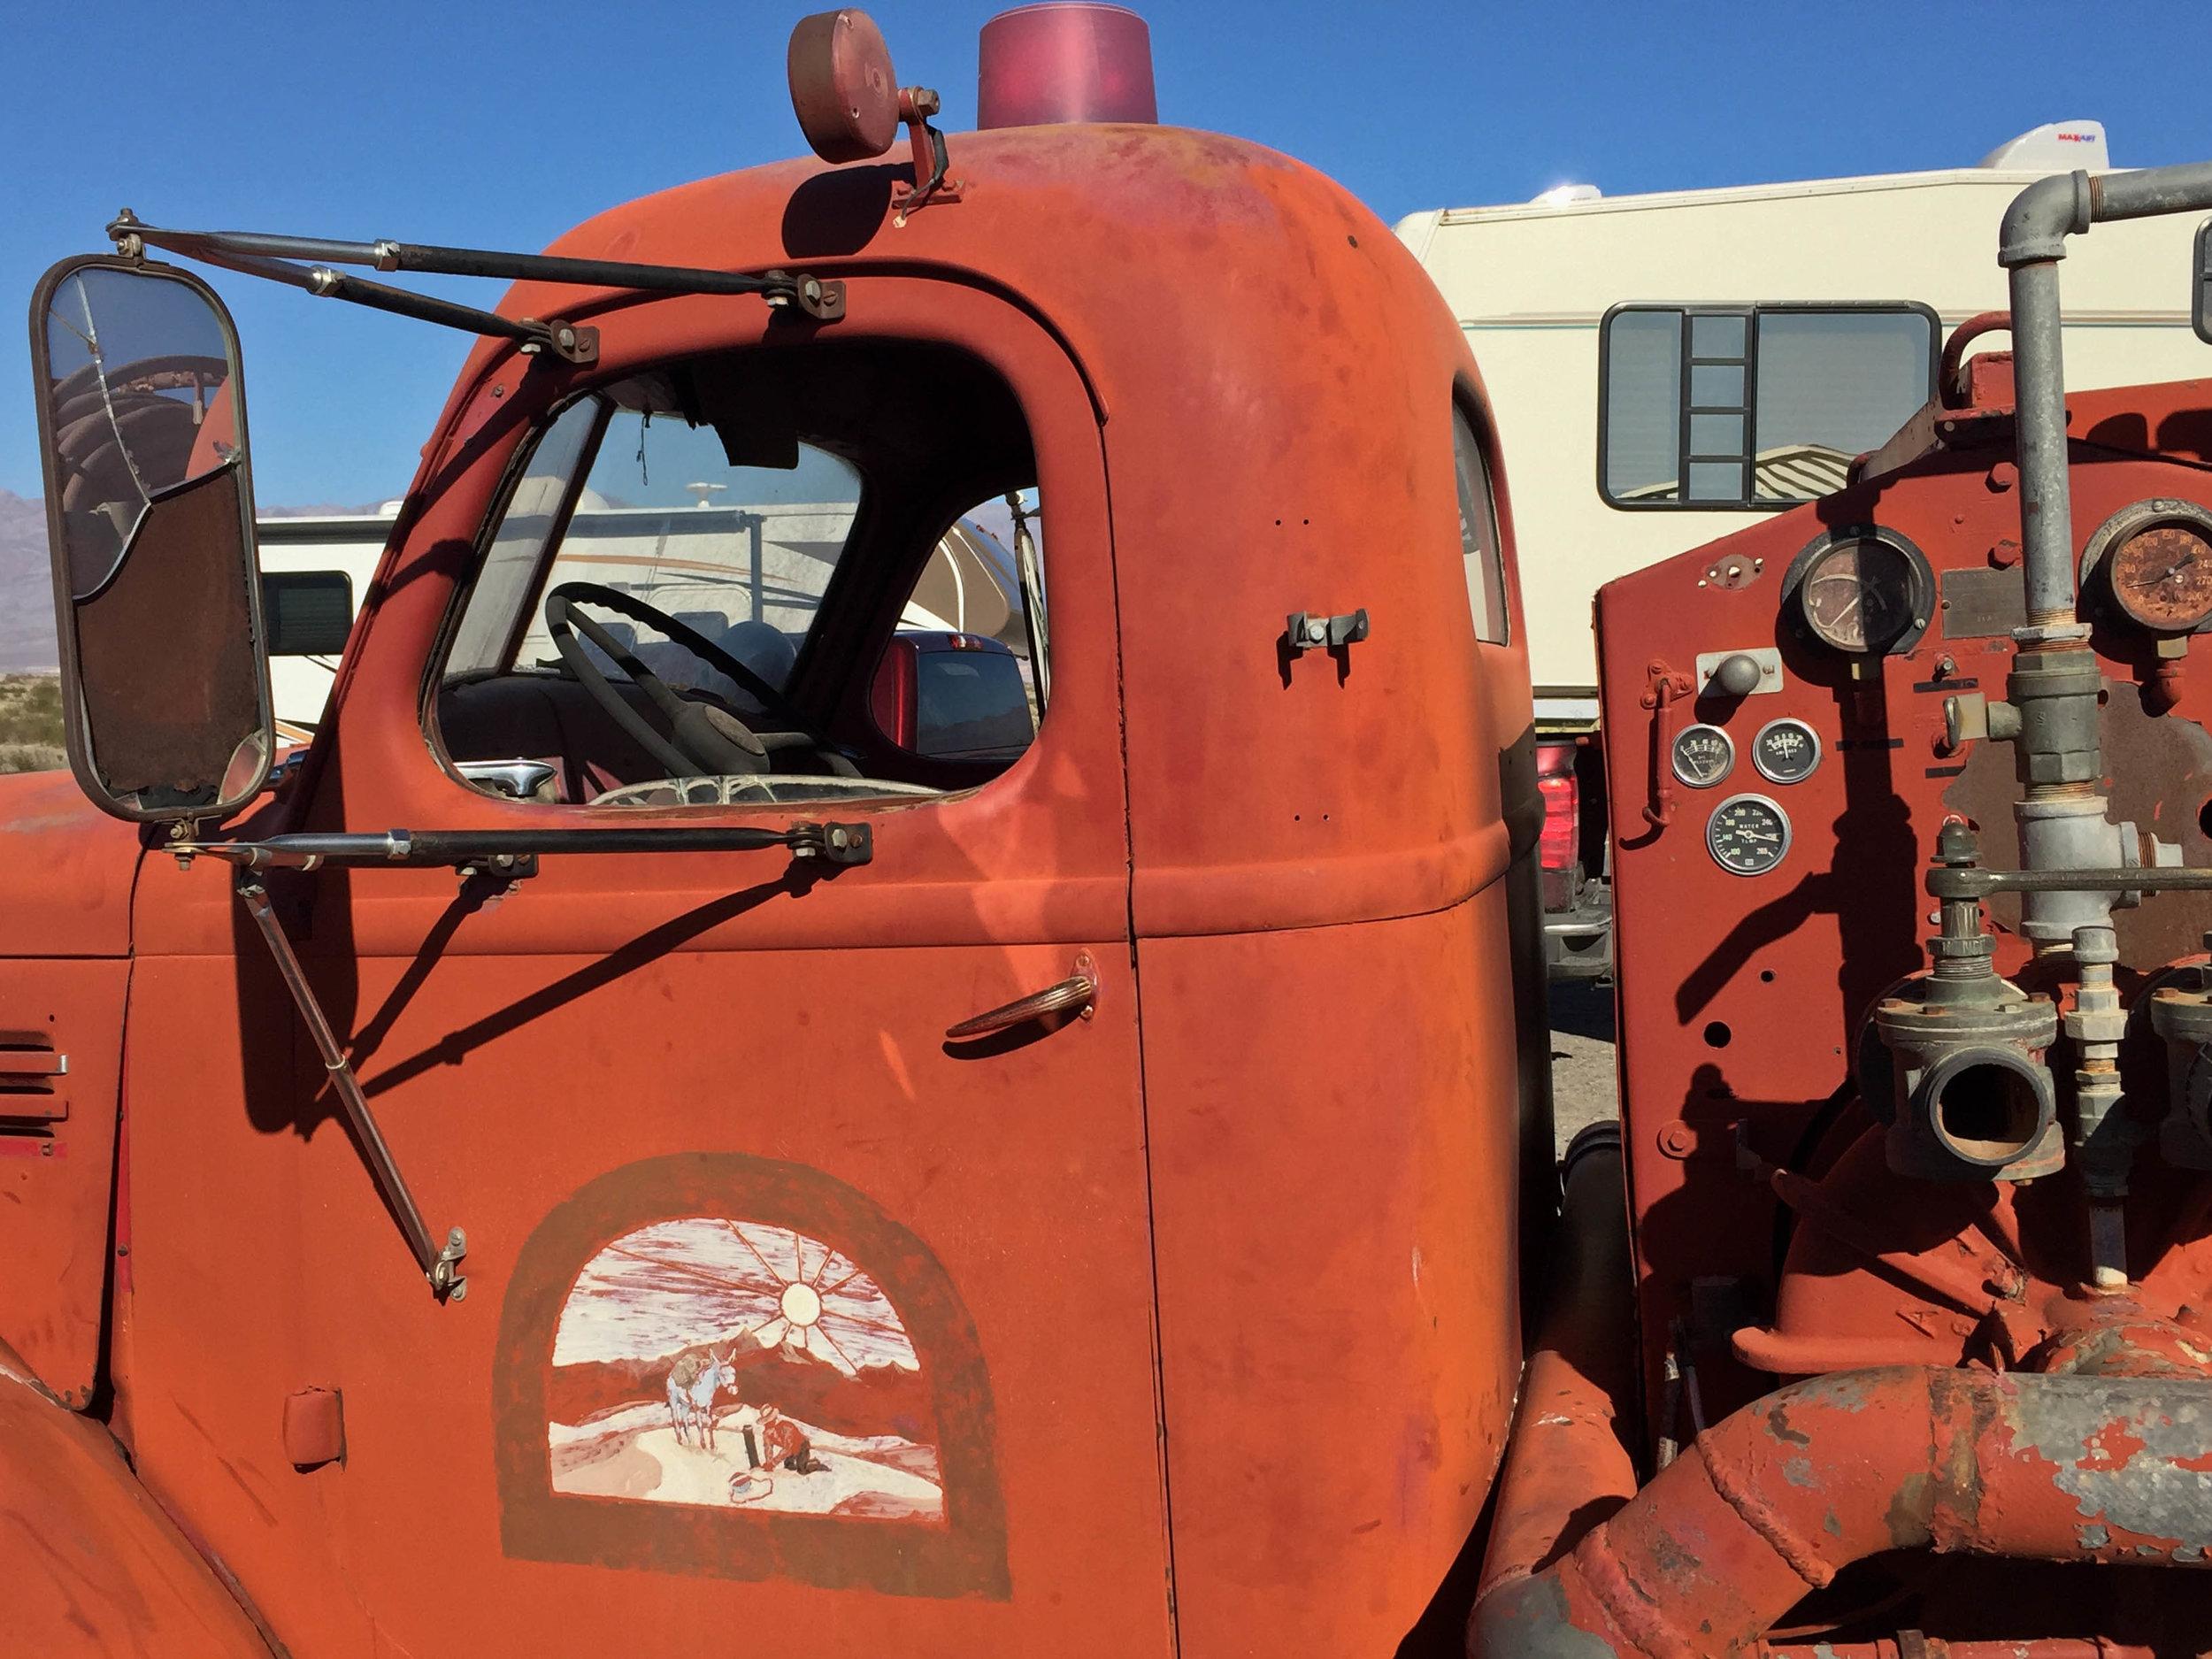 Old firetruck at Furnace Creek.